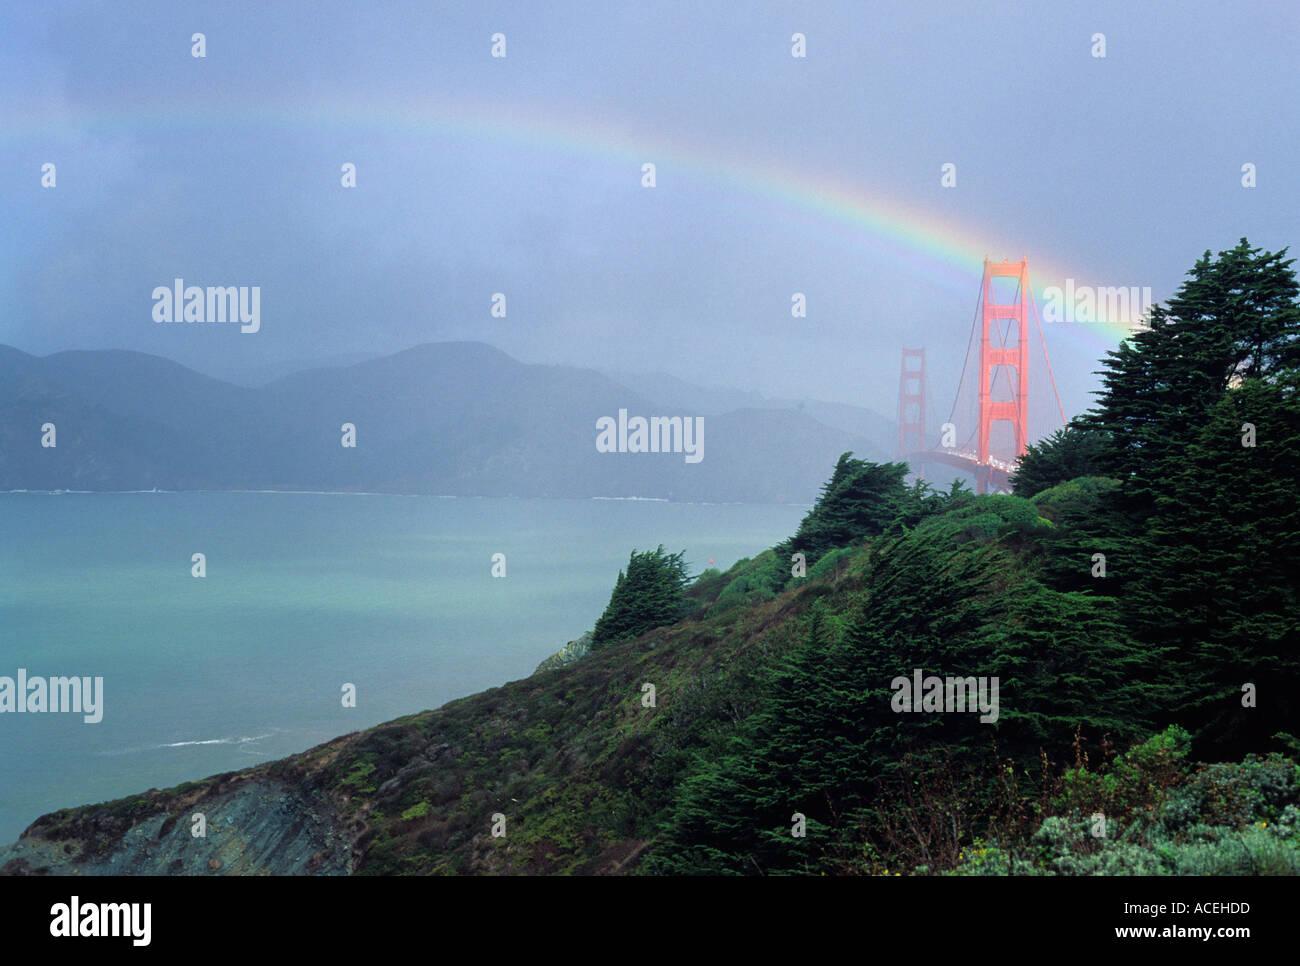 A rainbow over the Golden Gate Bridge San Francisco California United States of AmericaStock Photo